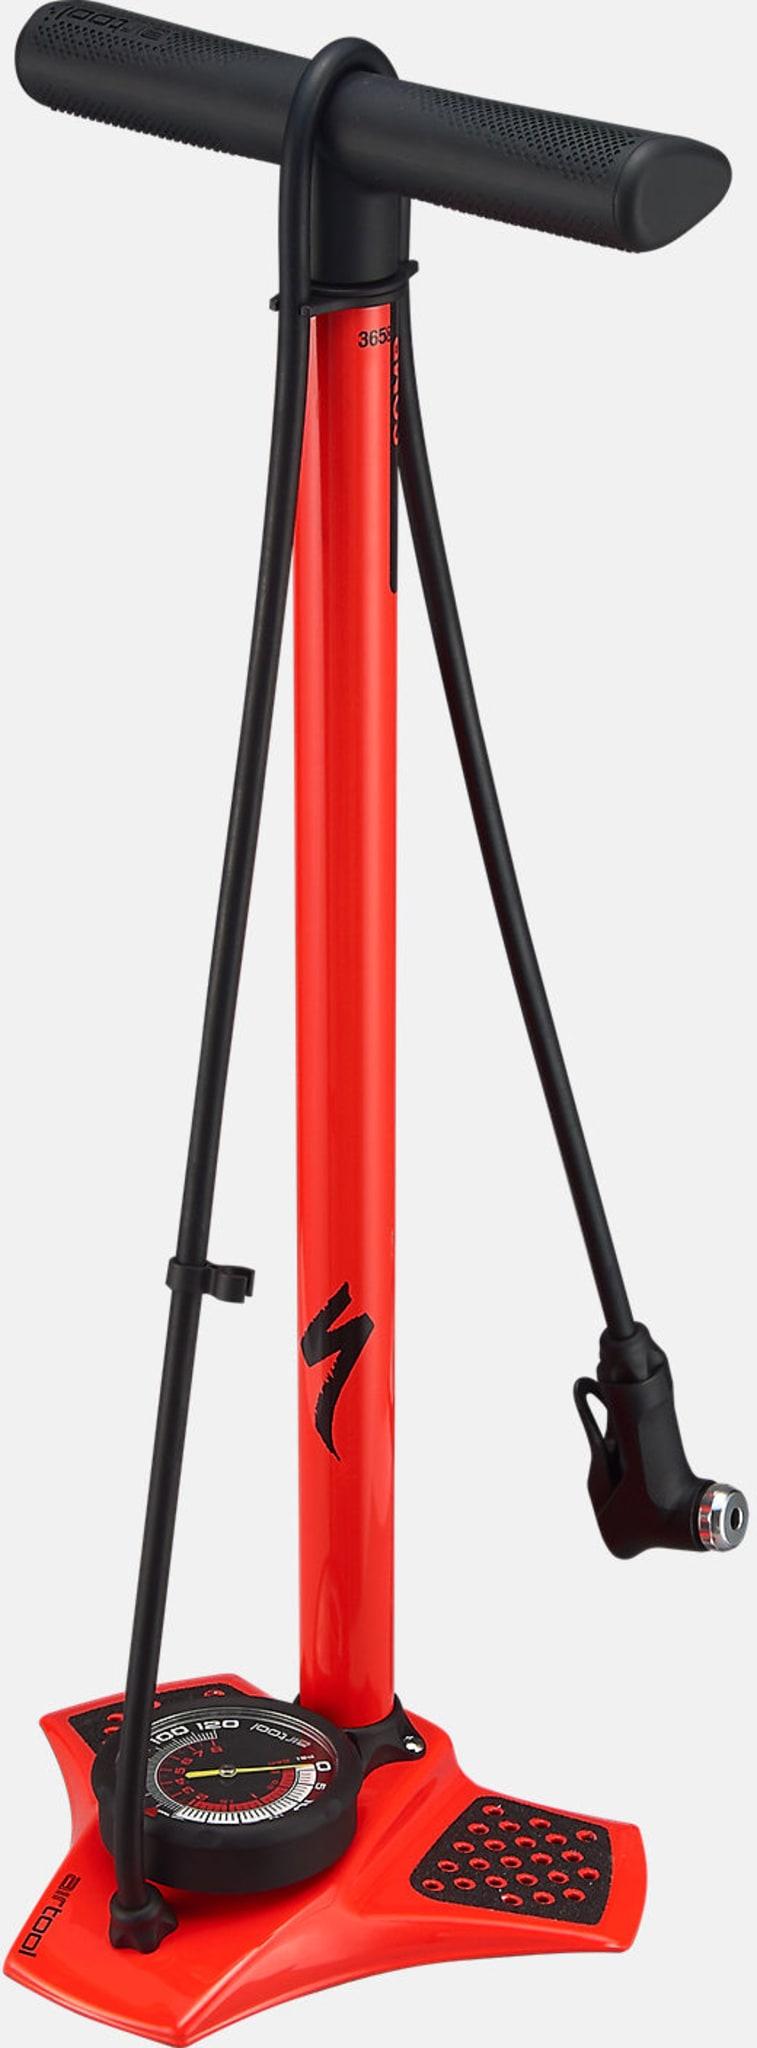 Suveren sykkelpumpe fra Specialized